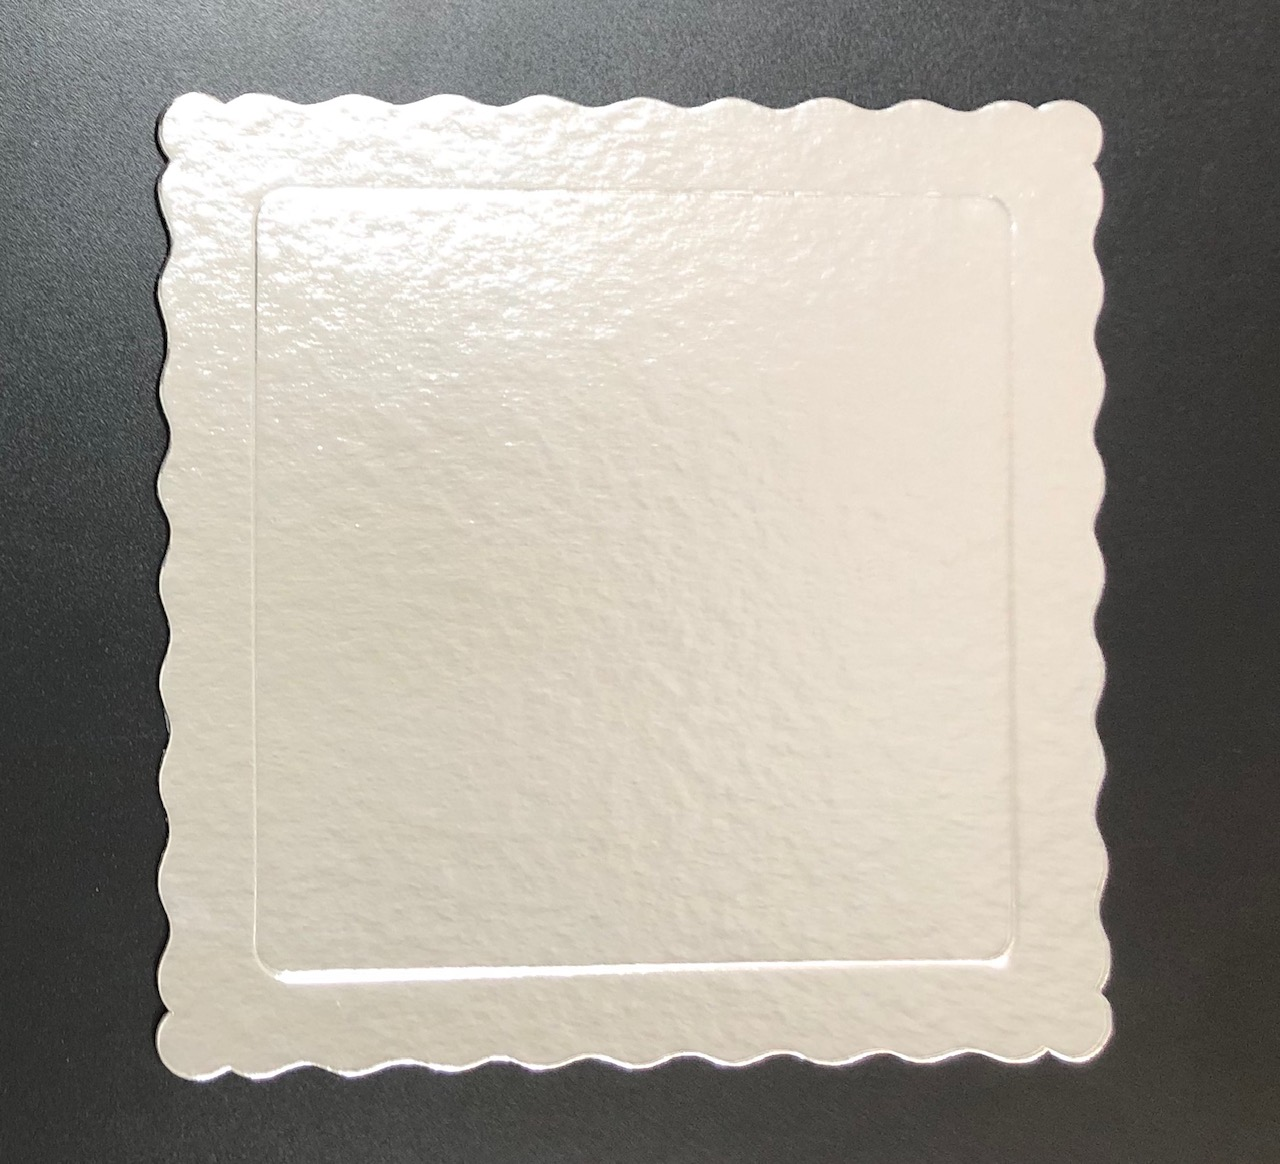 100 Bases Laminadas, Suporte P/ Bolo, Cake Board, 25x25cm - Prata